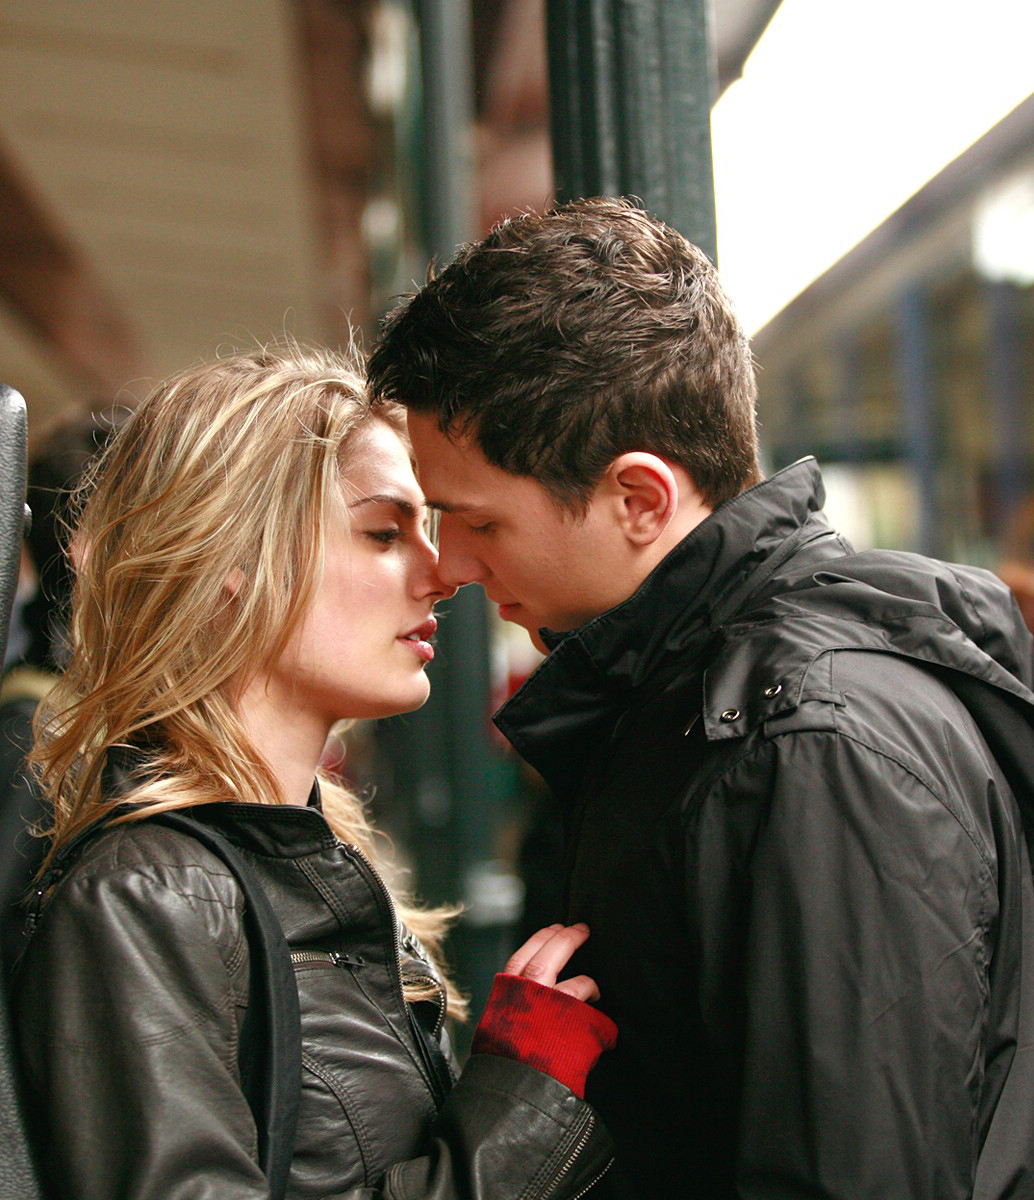 http://1.bp.blogspot.com/-eYnuE2SwU3I/ULzU47HlZWI/AAAAAAAABn4/egpy1DFVAvM/s1600/Romantic_love_romantic_couple_wallpaper_download_free+(20).jpg